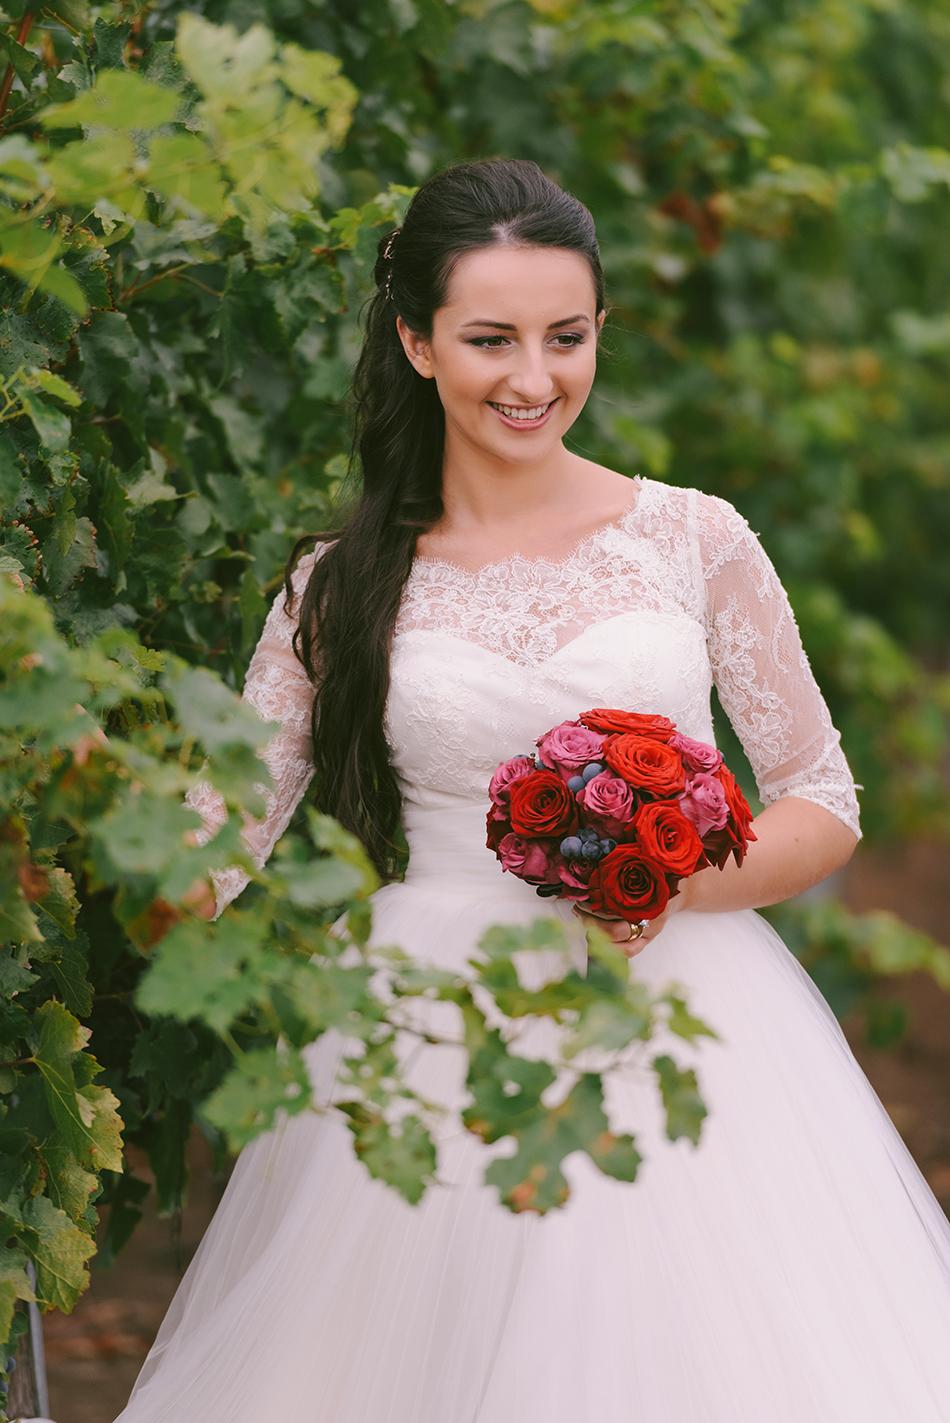 AD Passion Photography | damaris-si-gabi-ttd-afterwedding-timisoara_0011 | Adelin, Dida, fotograf profesionist, fotograf de nunta, fotografie de nunta, fotograf Timisoara, fotograf Craiova, fotograf Bucuresti, fotograf Arad, nunta Timisoara, nunta Arad, nunta Bucuresti, nunta Craiova